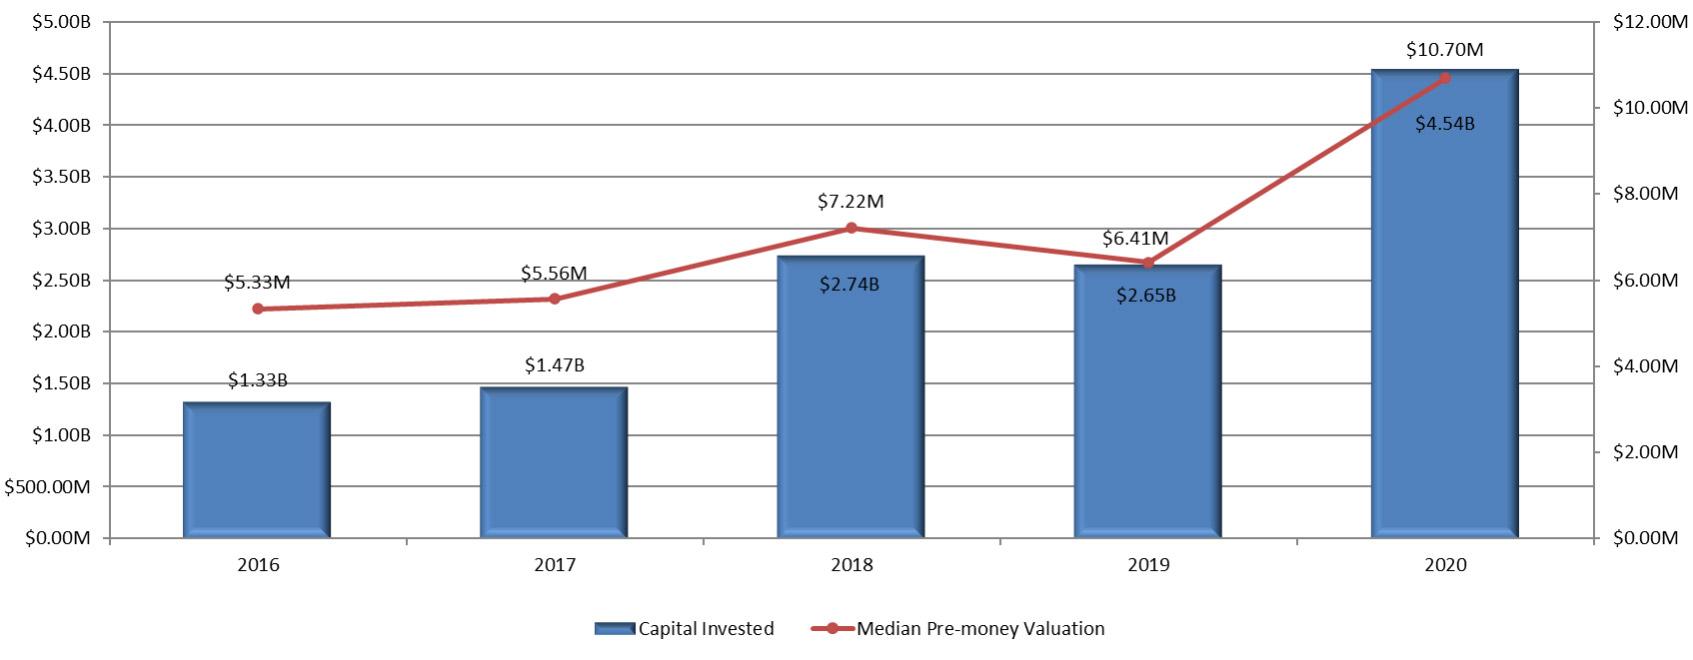 Venture capital raised and median pre-money valuations – European biotechs